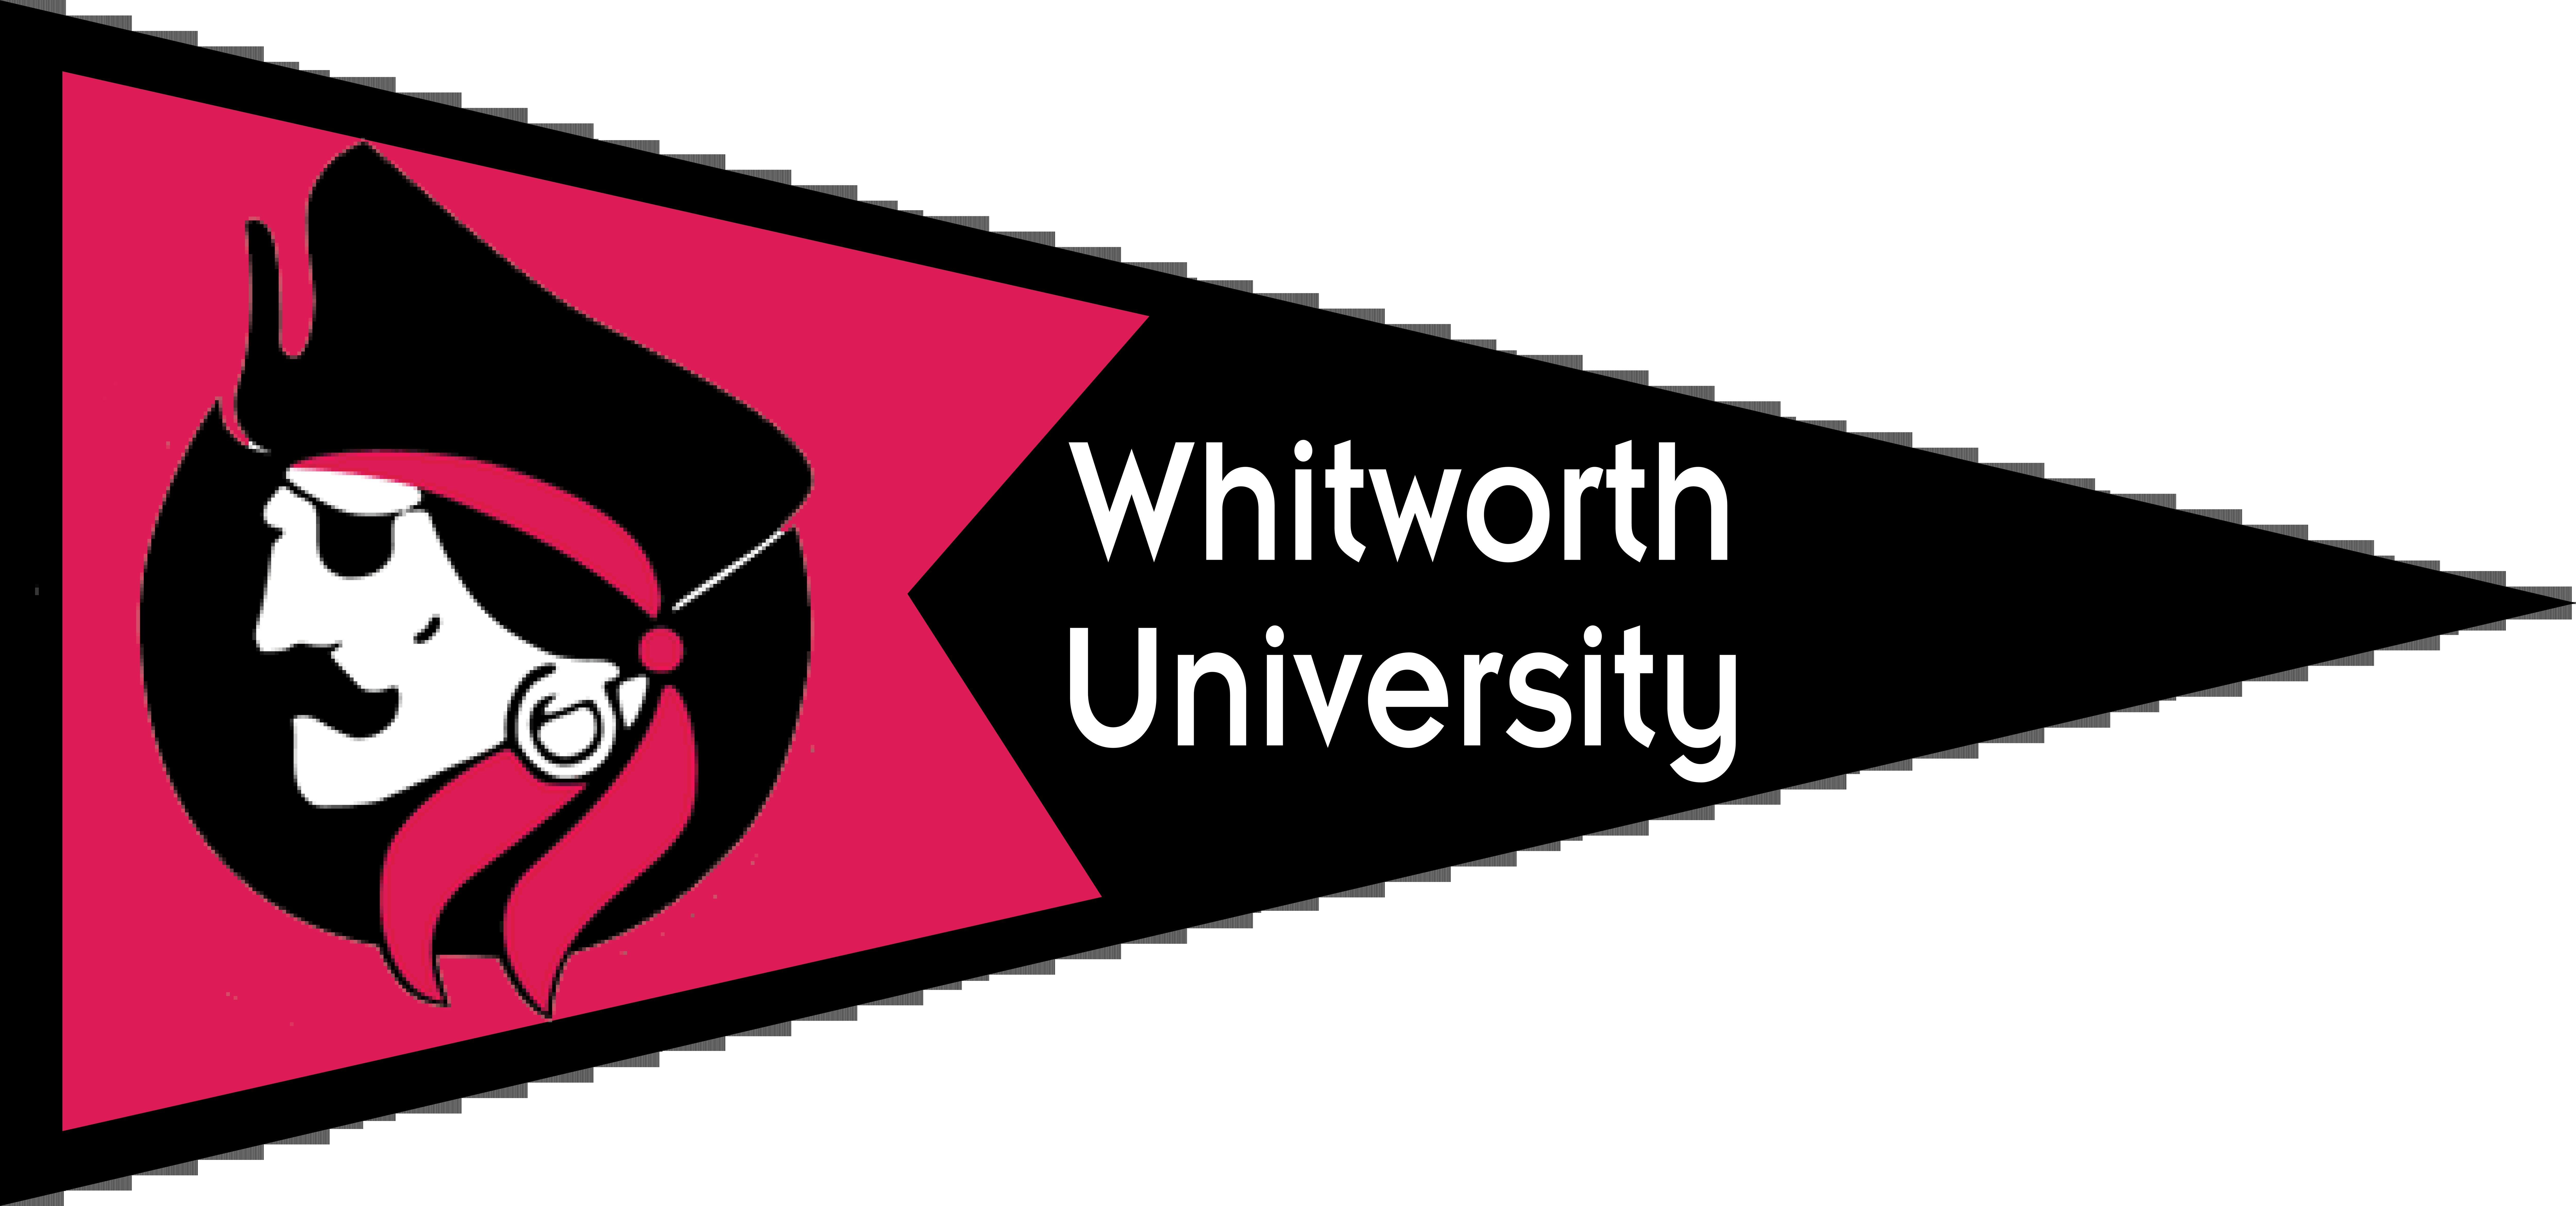 Financial clipart spreadsheet. Whitworth university pennant gear